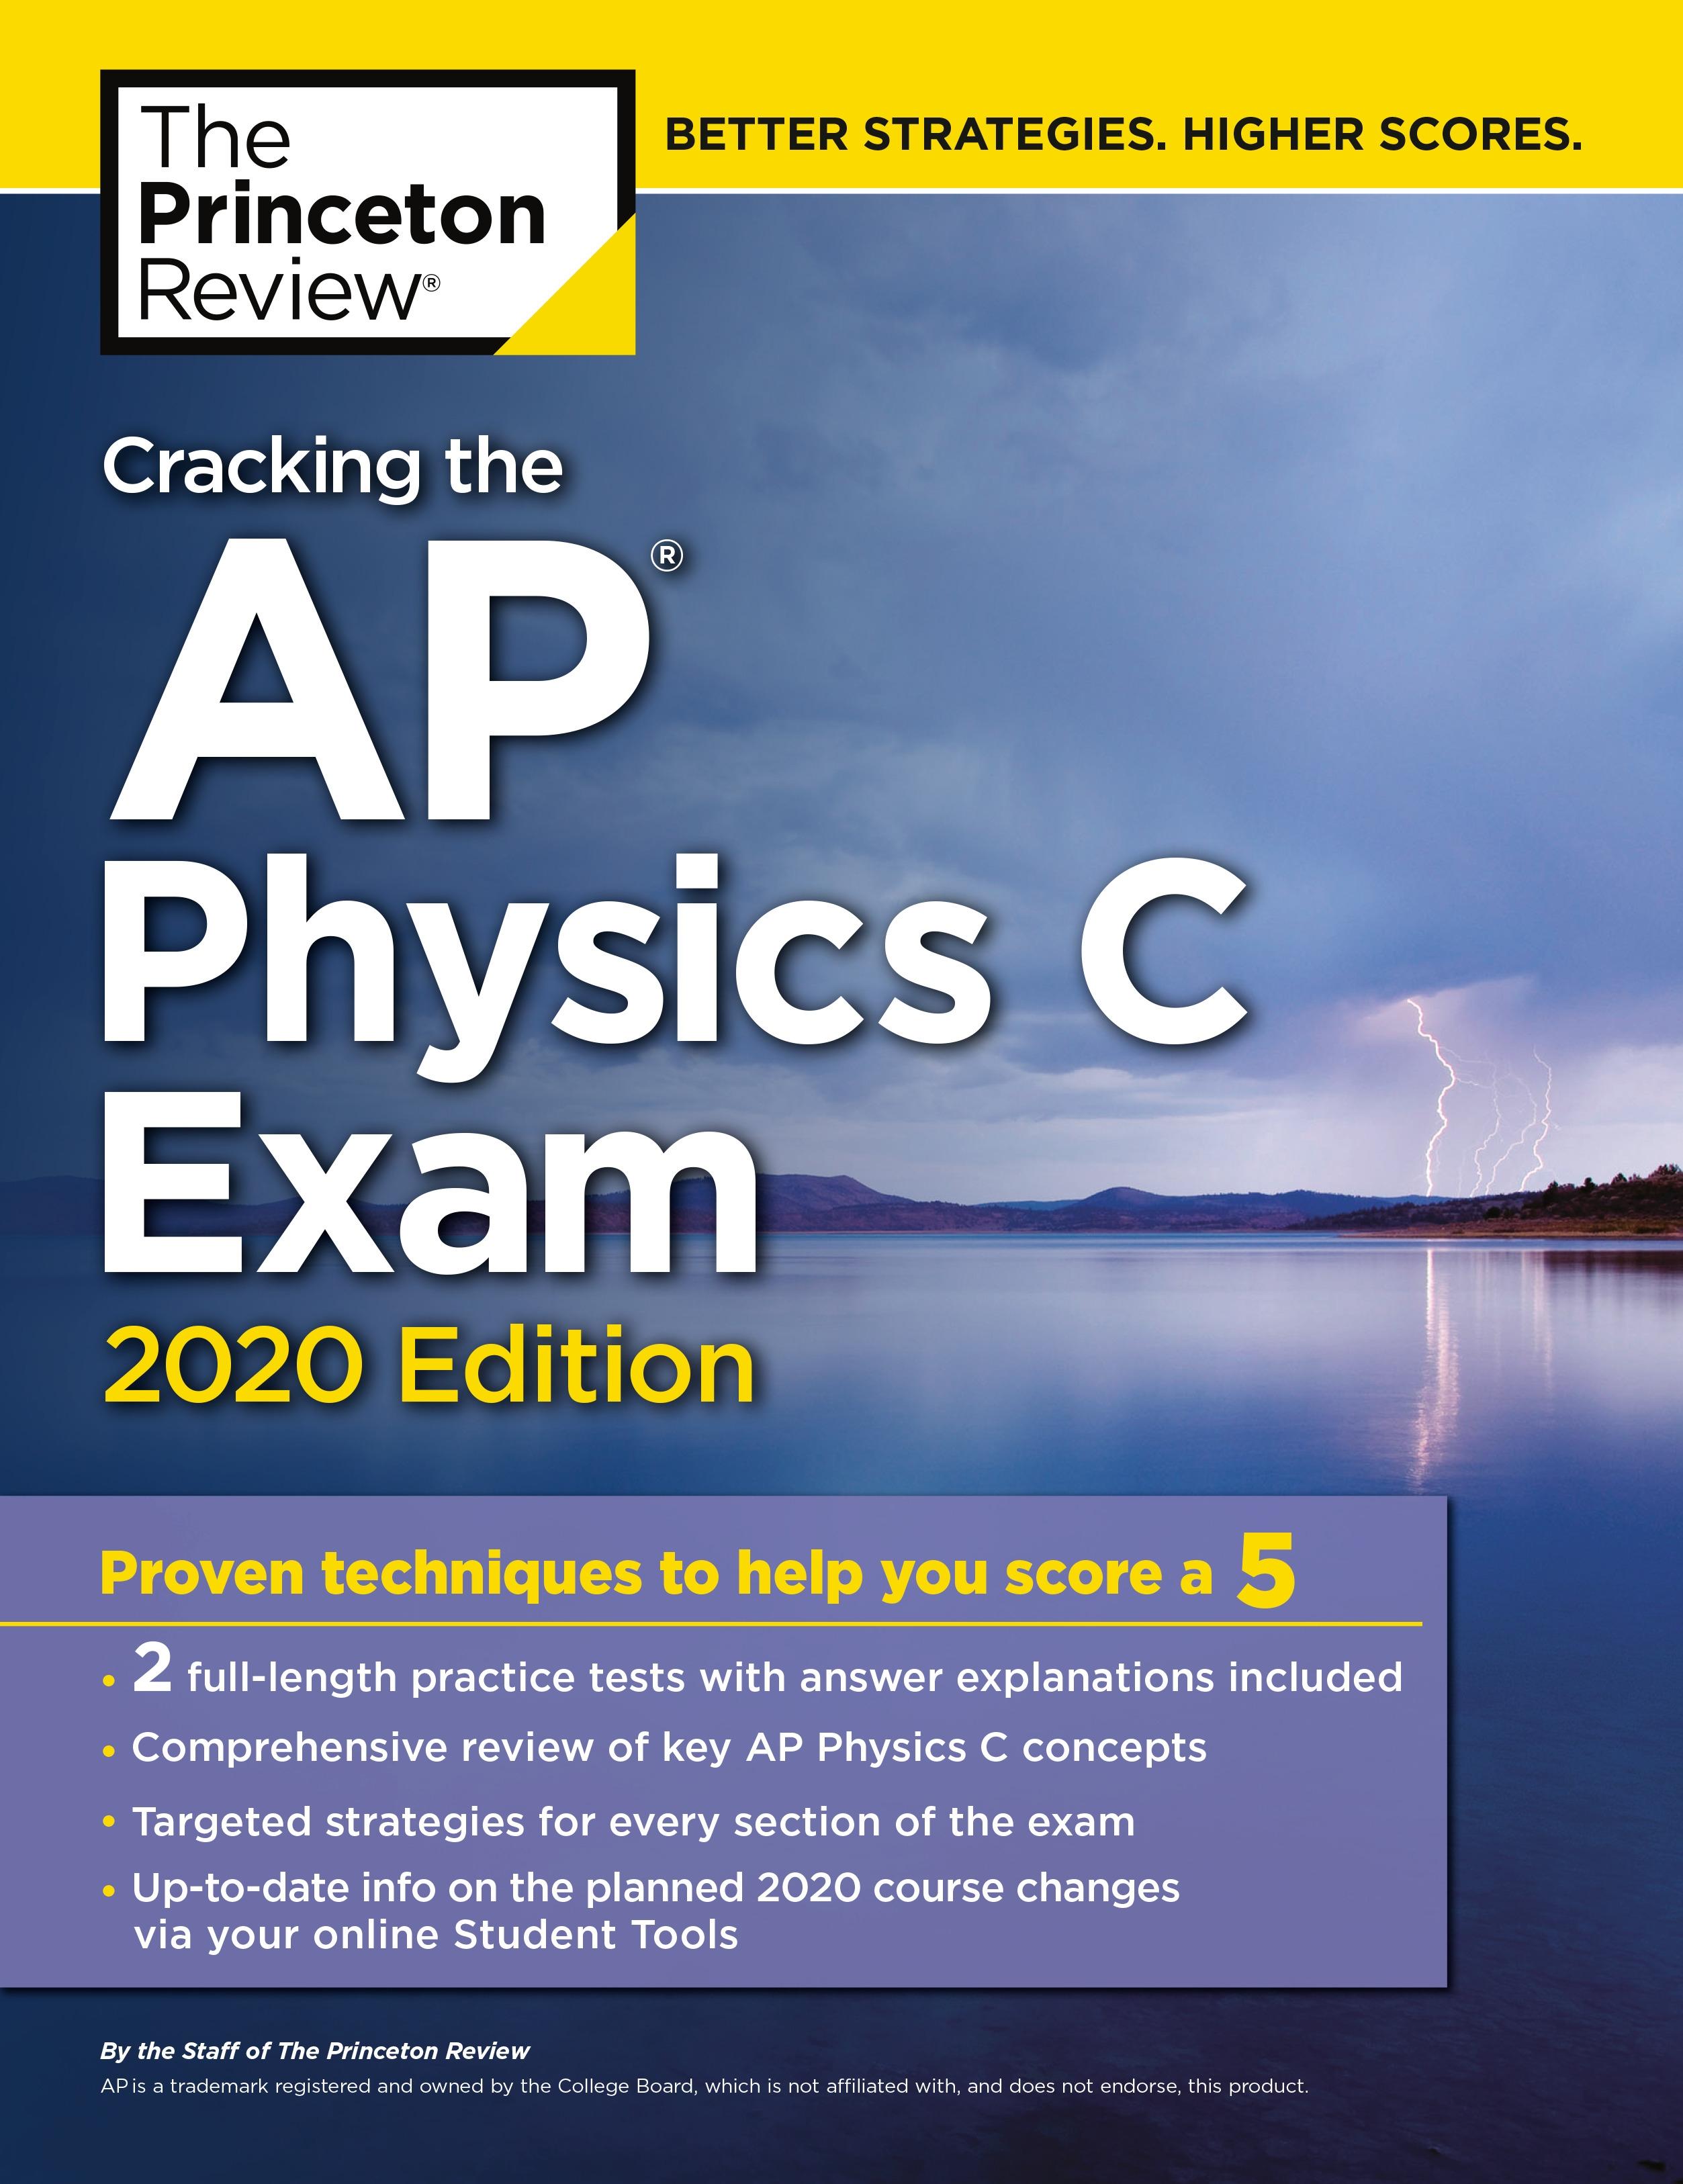 Cracking the AP Physics C Exam, 2020 Edition - Penguin Books